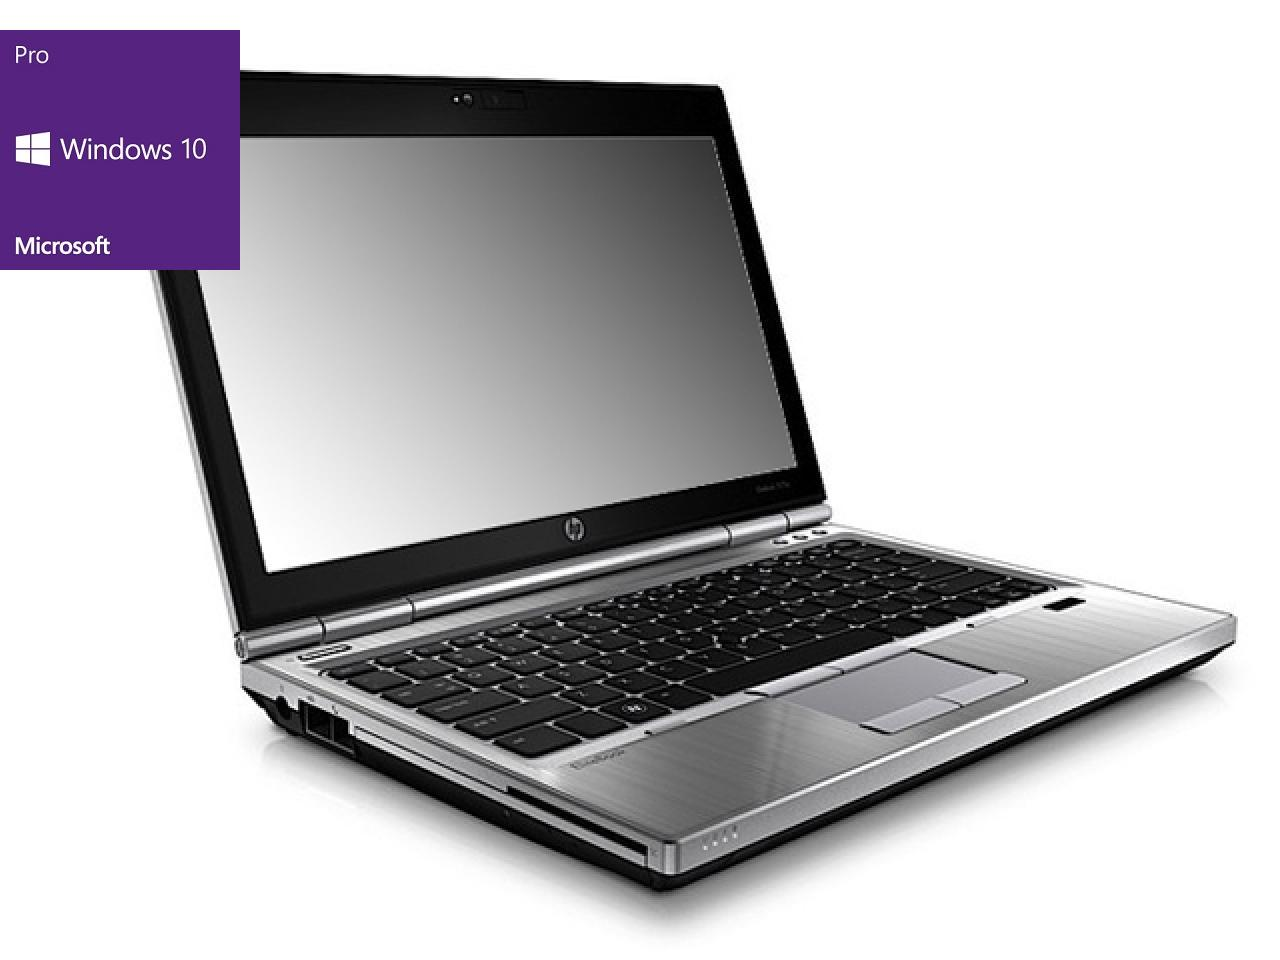 Hewlett Packard EliteBook 2570p